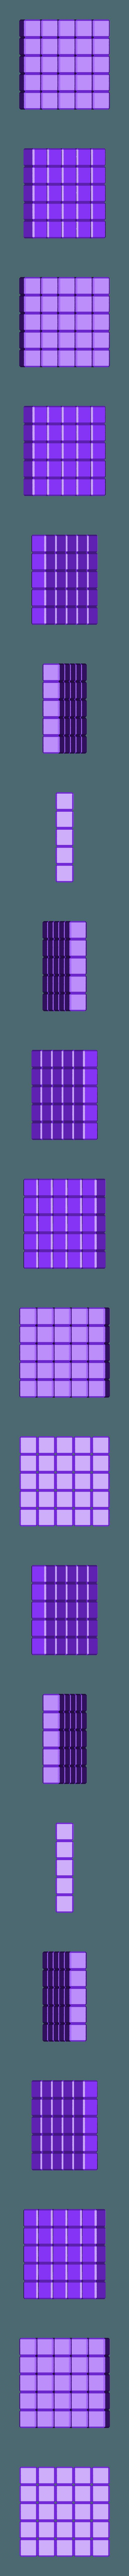 sevenTop.stl Download free STL file Nesting Cubes, Recursive Cubes, Cubes within Cubes • 3D printer template, LGBU